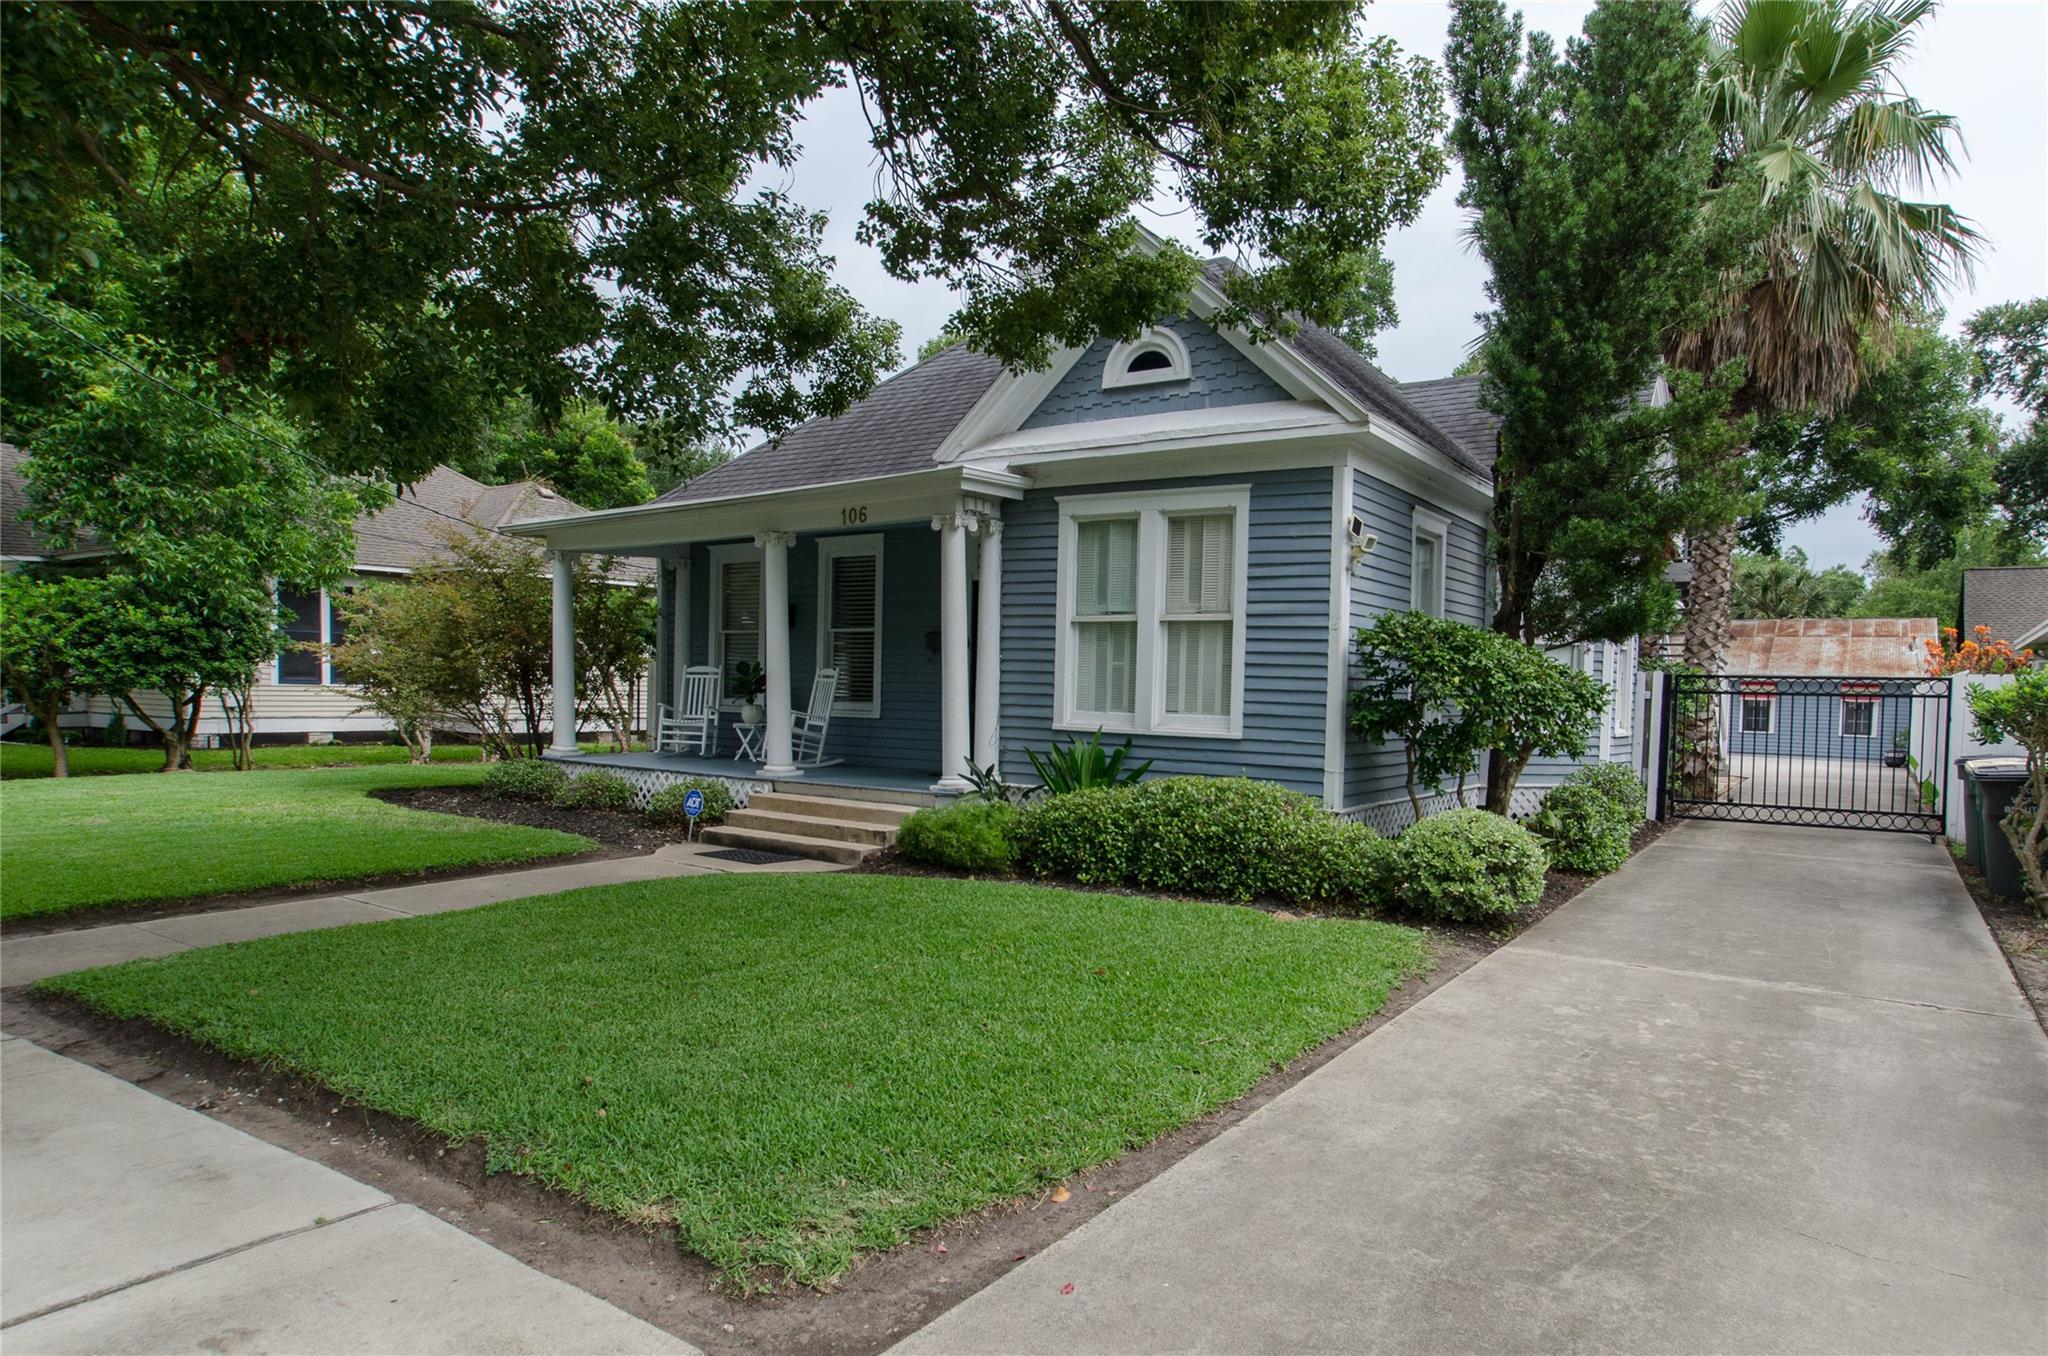 106 W San Antonio Property Photo - Victoria, TX real estate listing